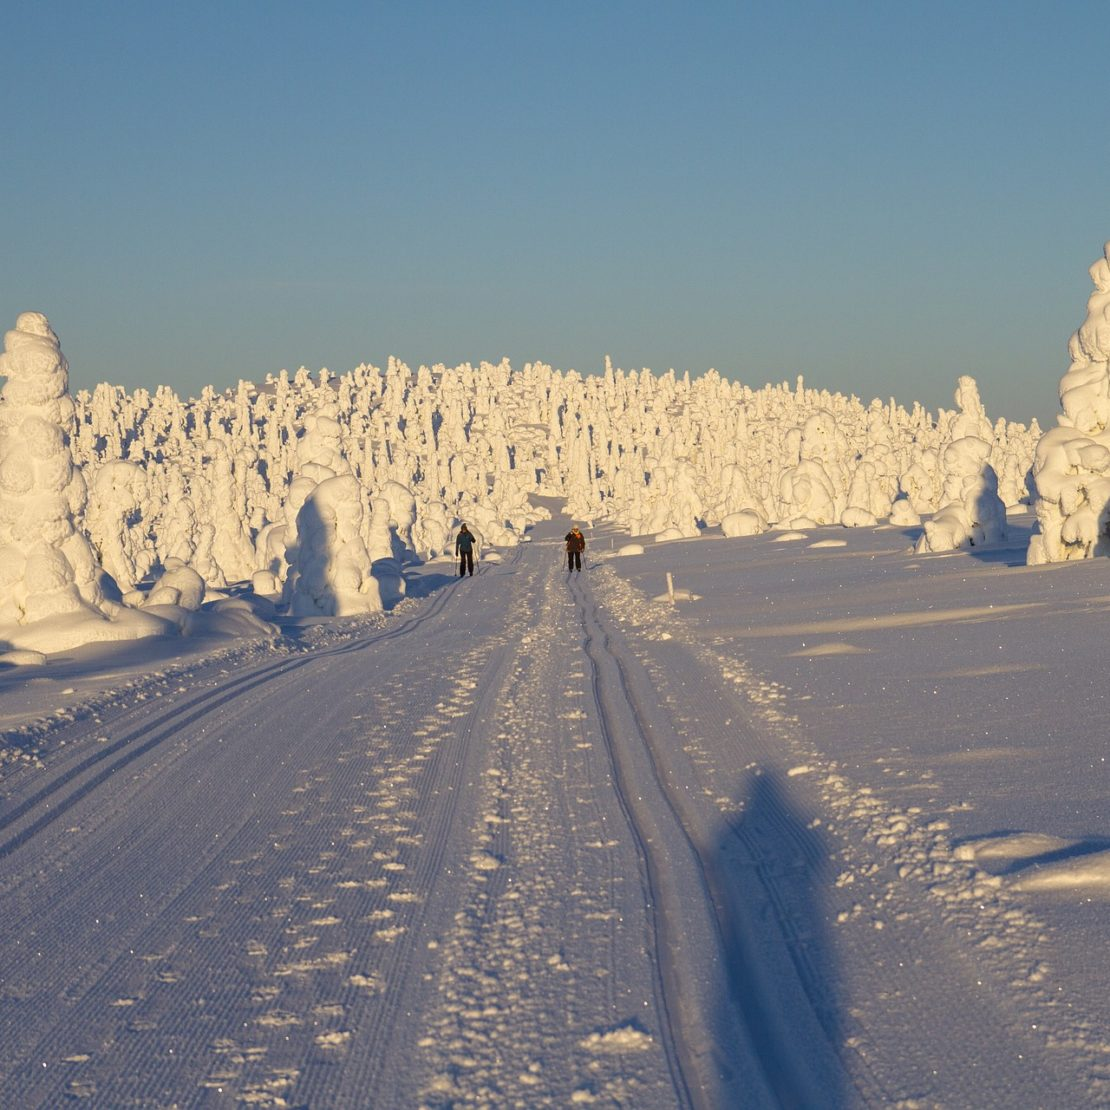 finland-2215308_1920